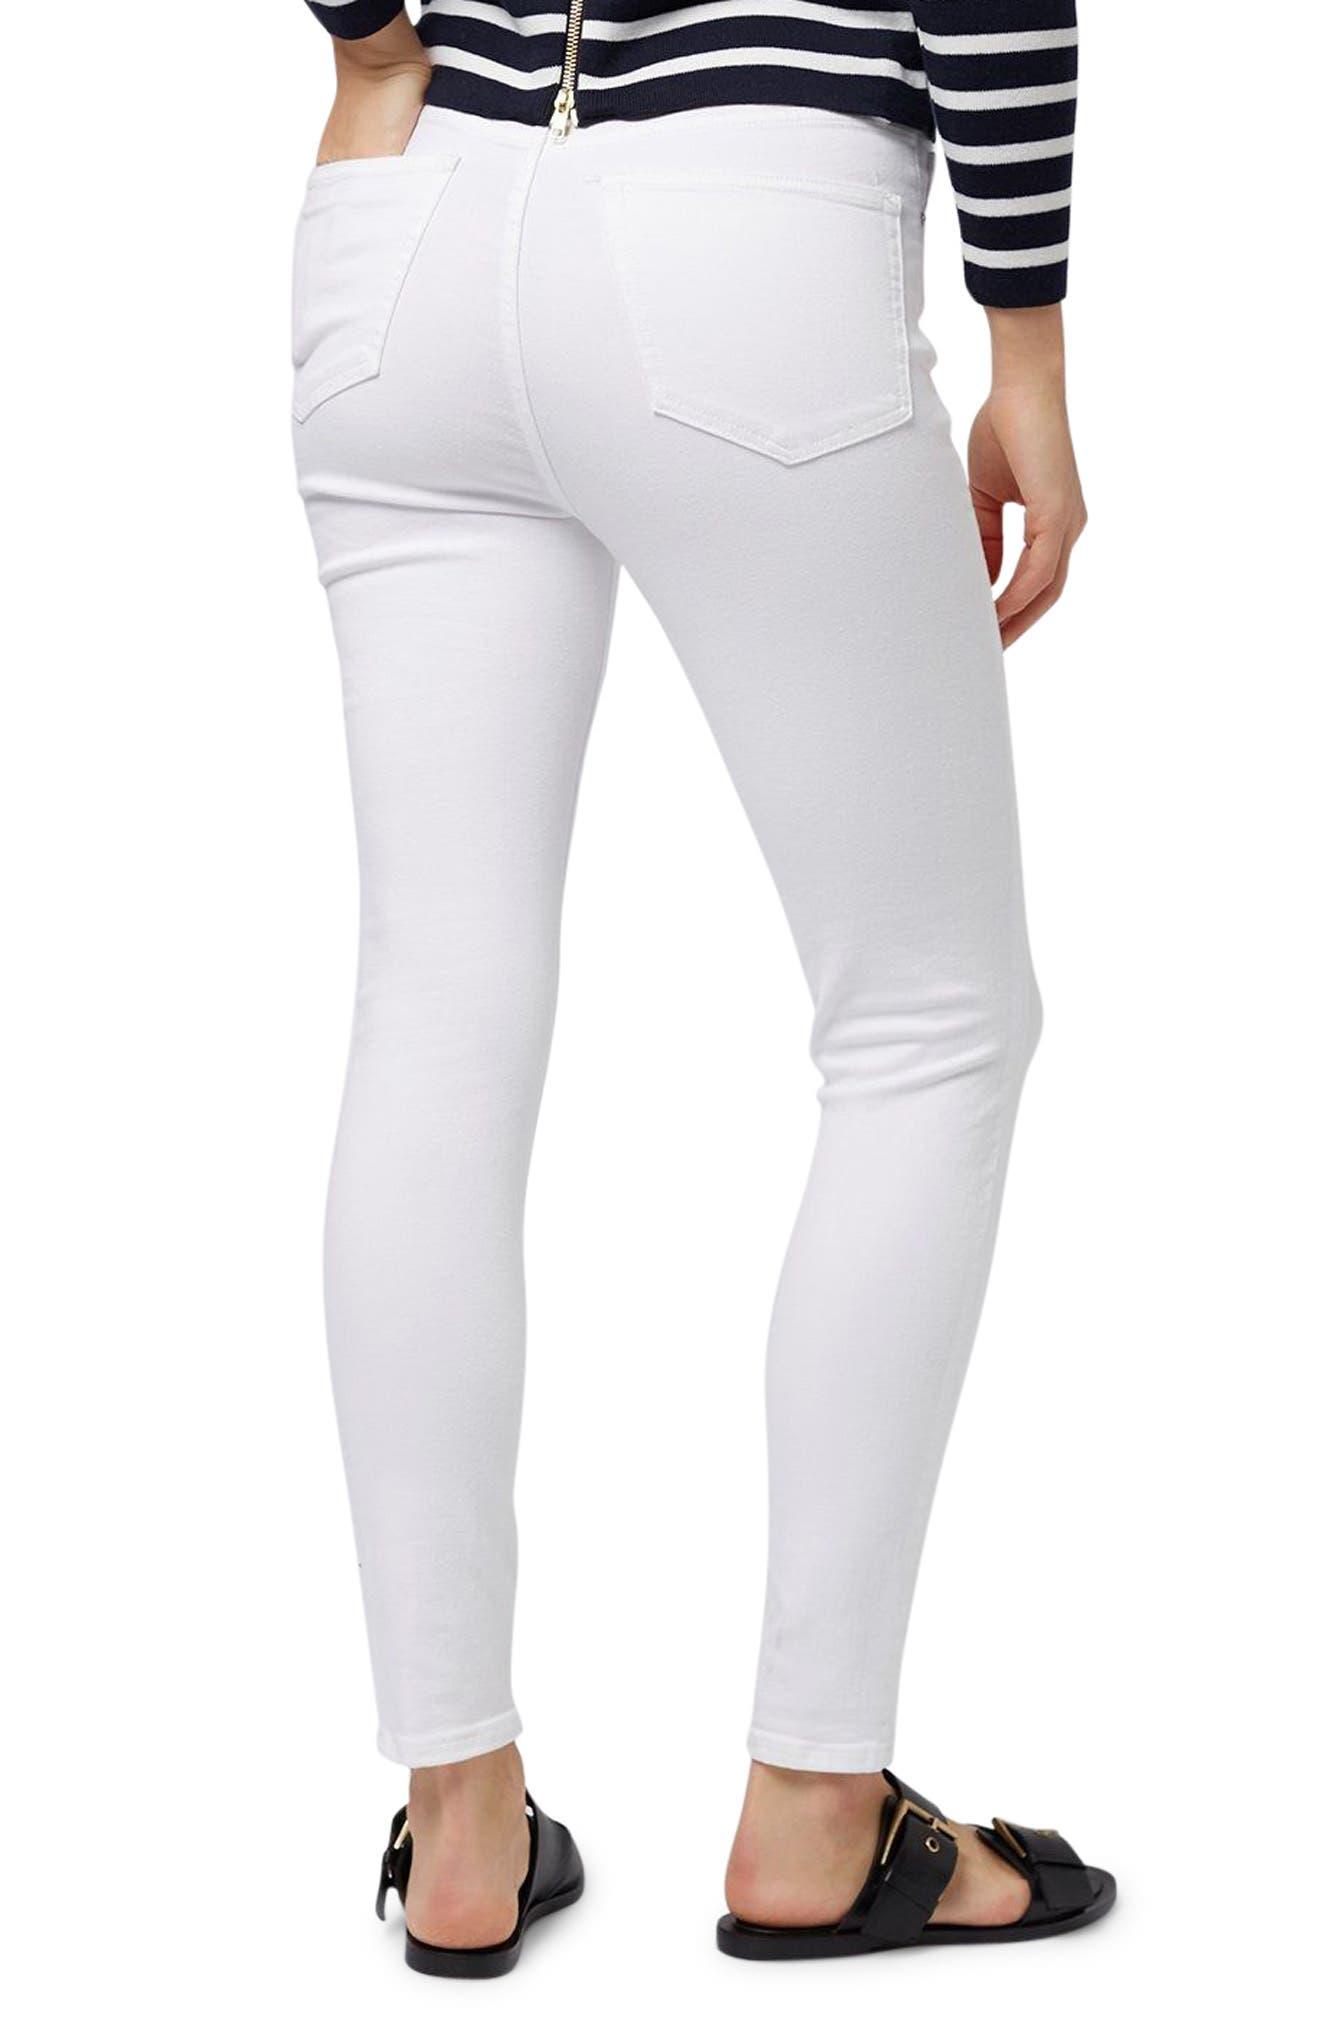 Moto Jamie Jeans,                             Alternate thumbnail 3, color,                             White